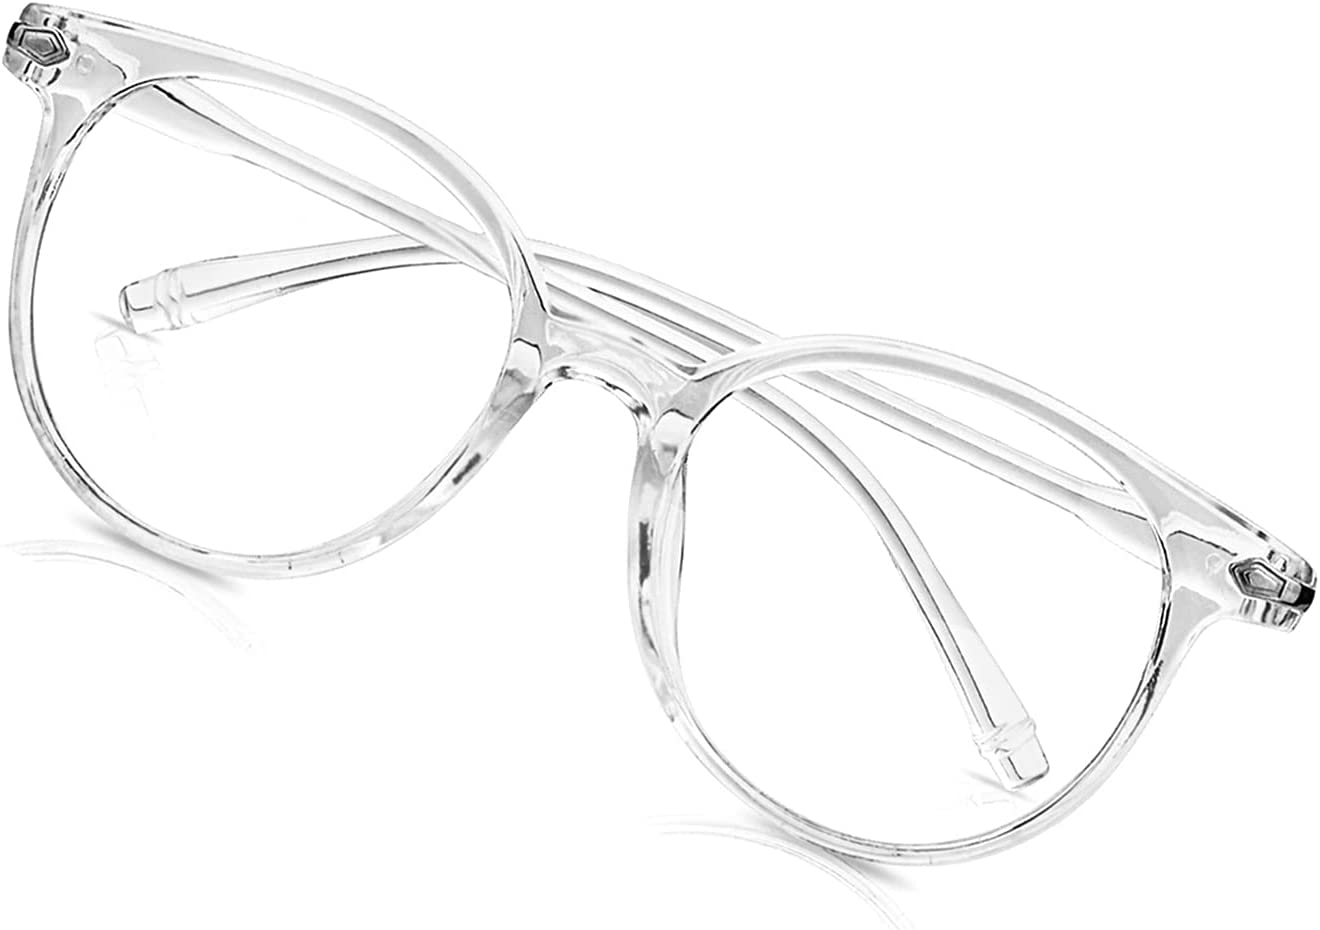 Craebuer Blue Blockers Glasses for Women Men, Retro Round Blue light Blocking Reading Eyeglasses with Lightweight Frame, Anti Eyestrain UV Glare Filter Eyewear